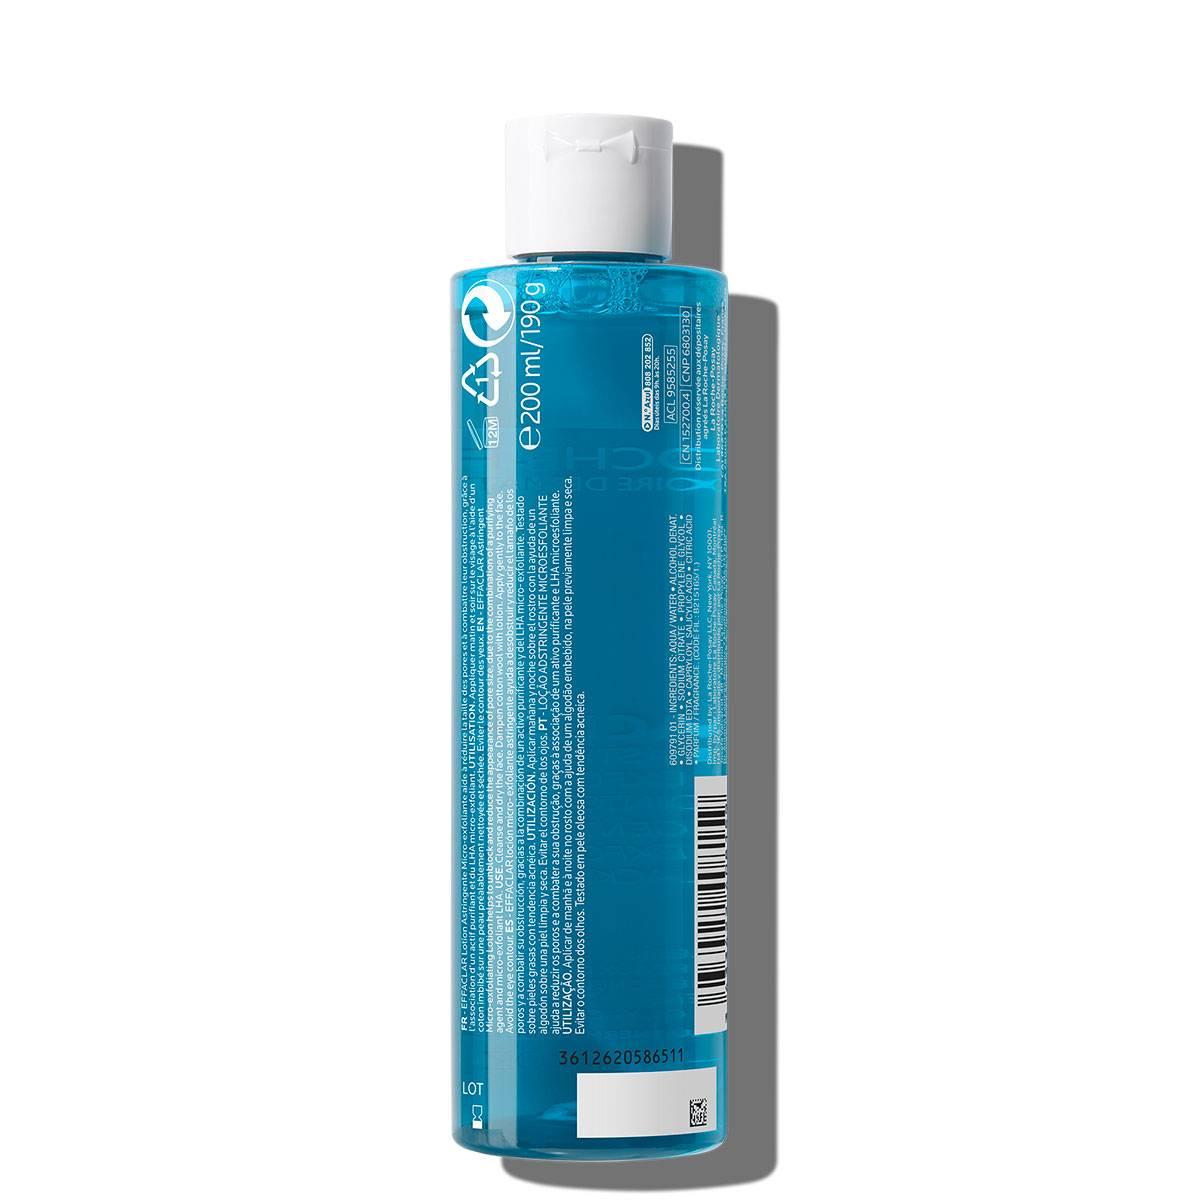 La Roche Posay Ansiktsvård Effaclar Micro Exfoliating Astringent Toner 2